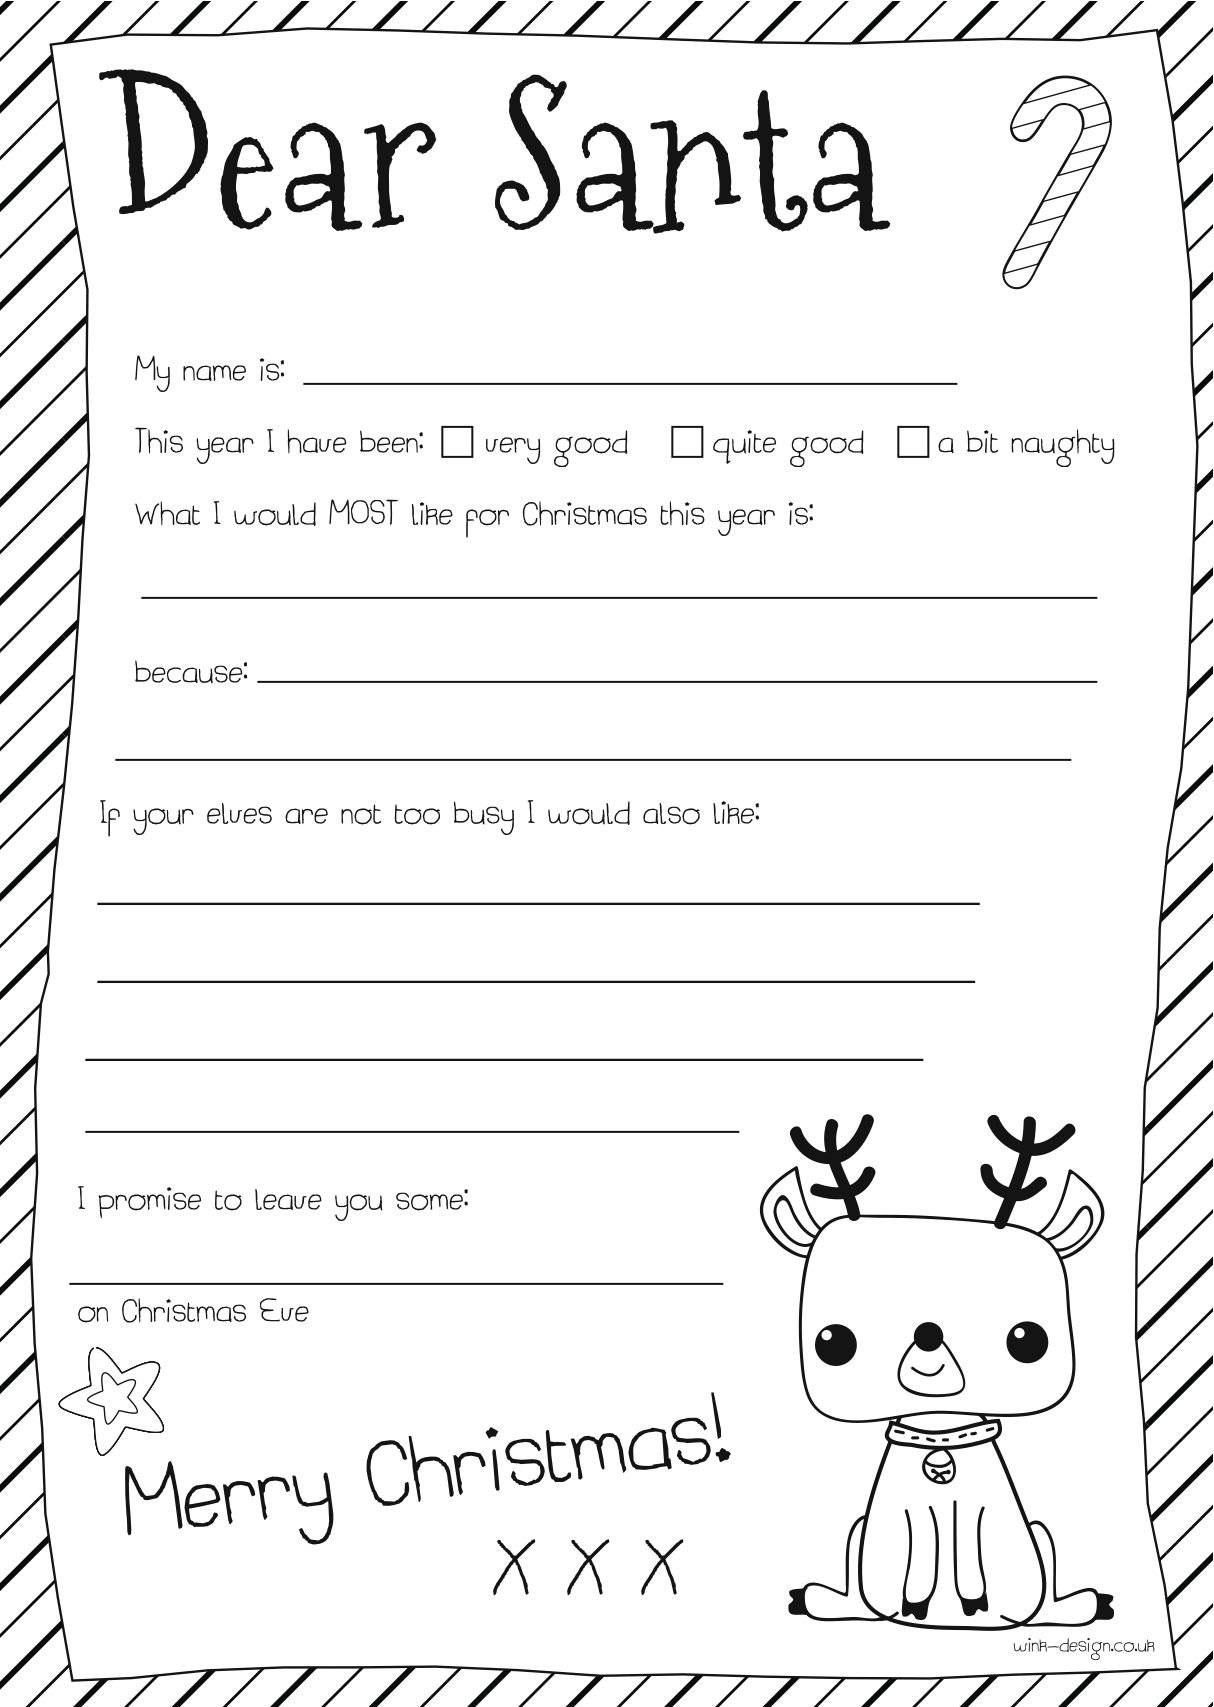 Free Santa Letter Printable Dear Santa Letter